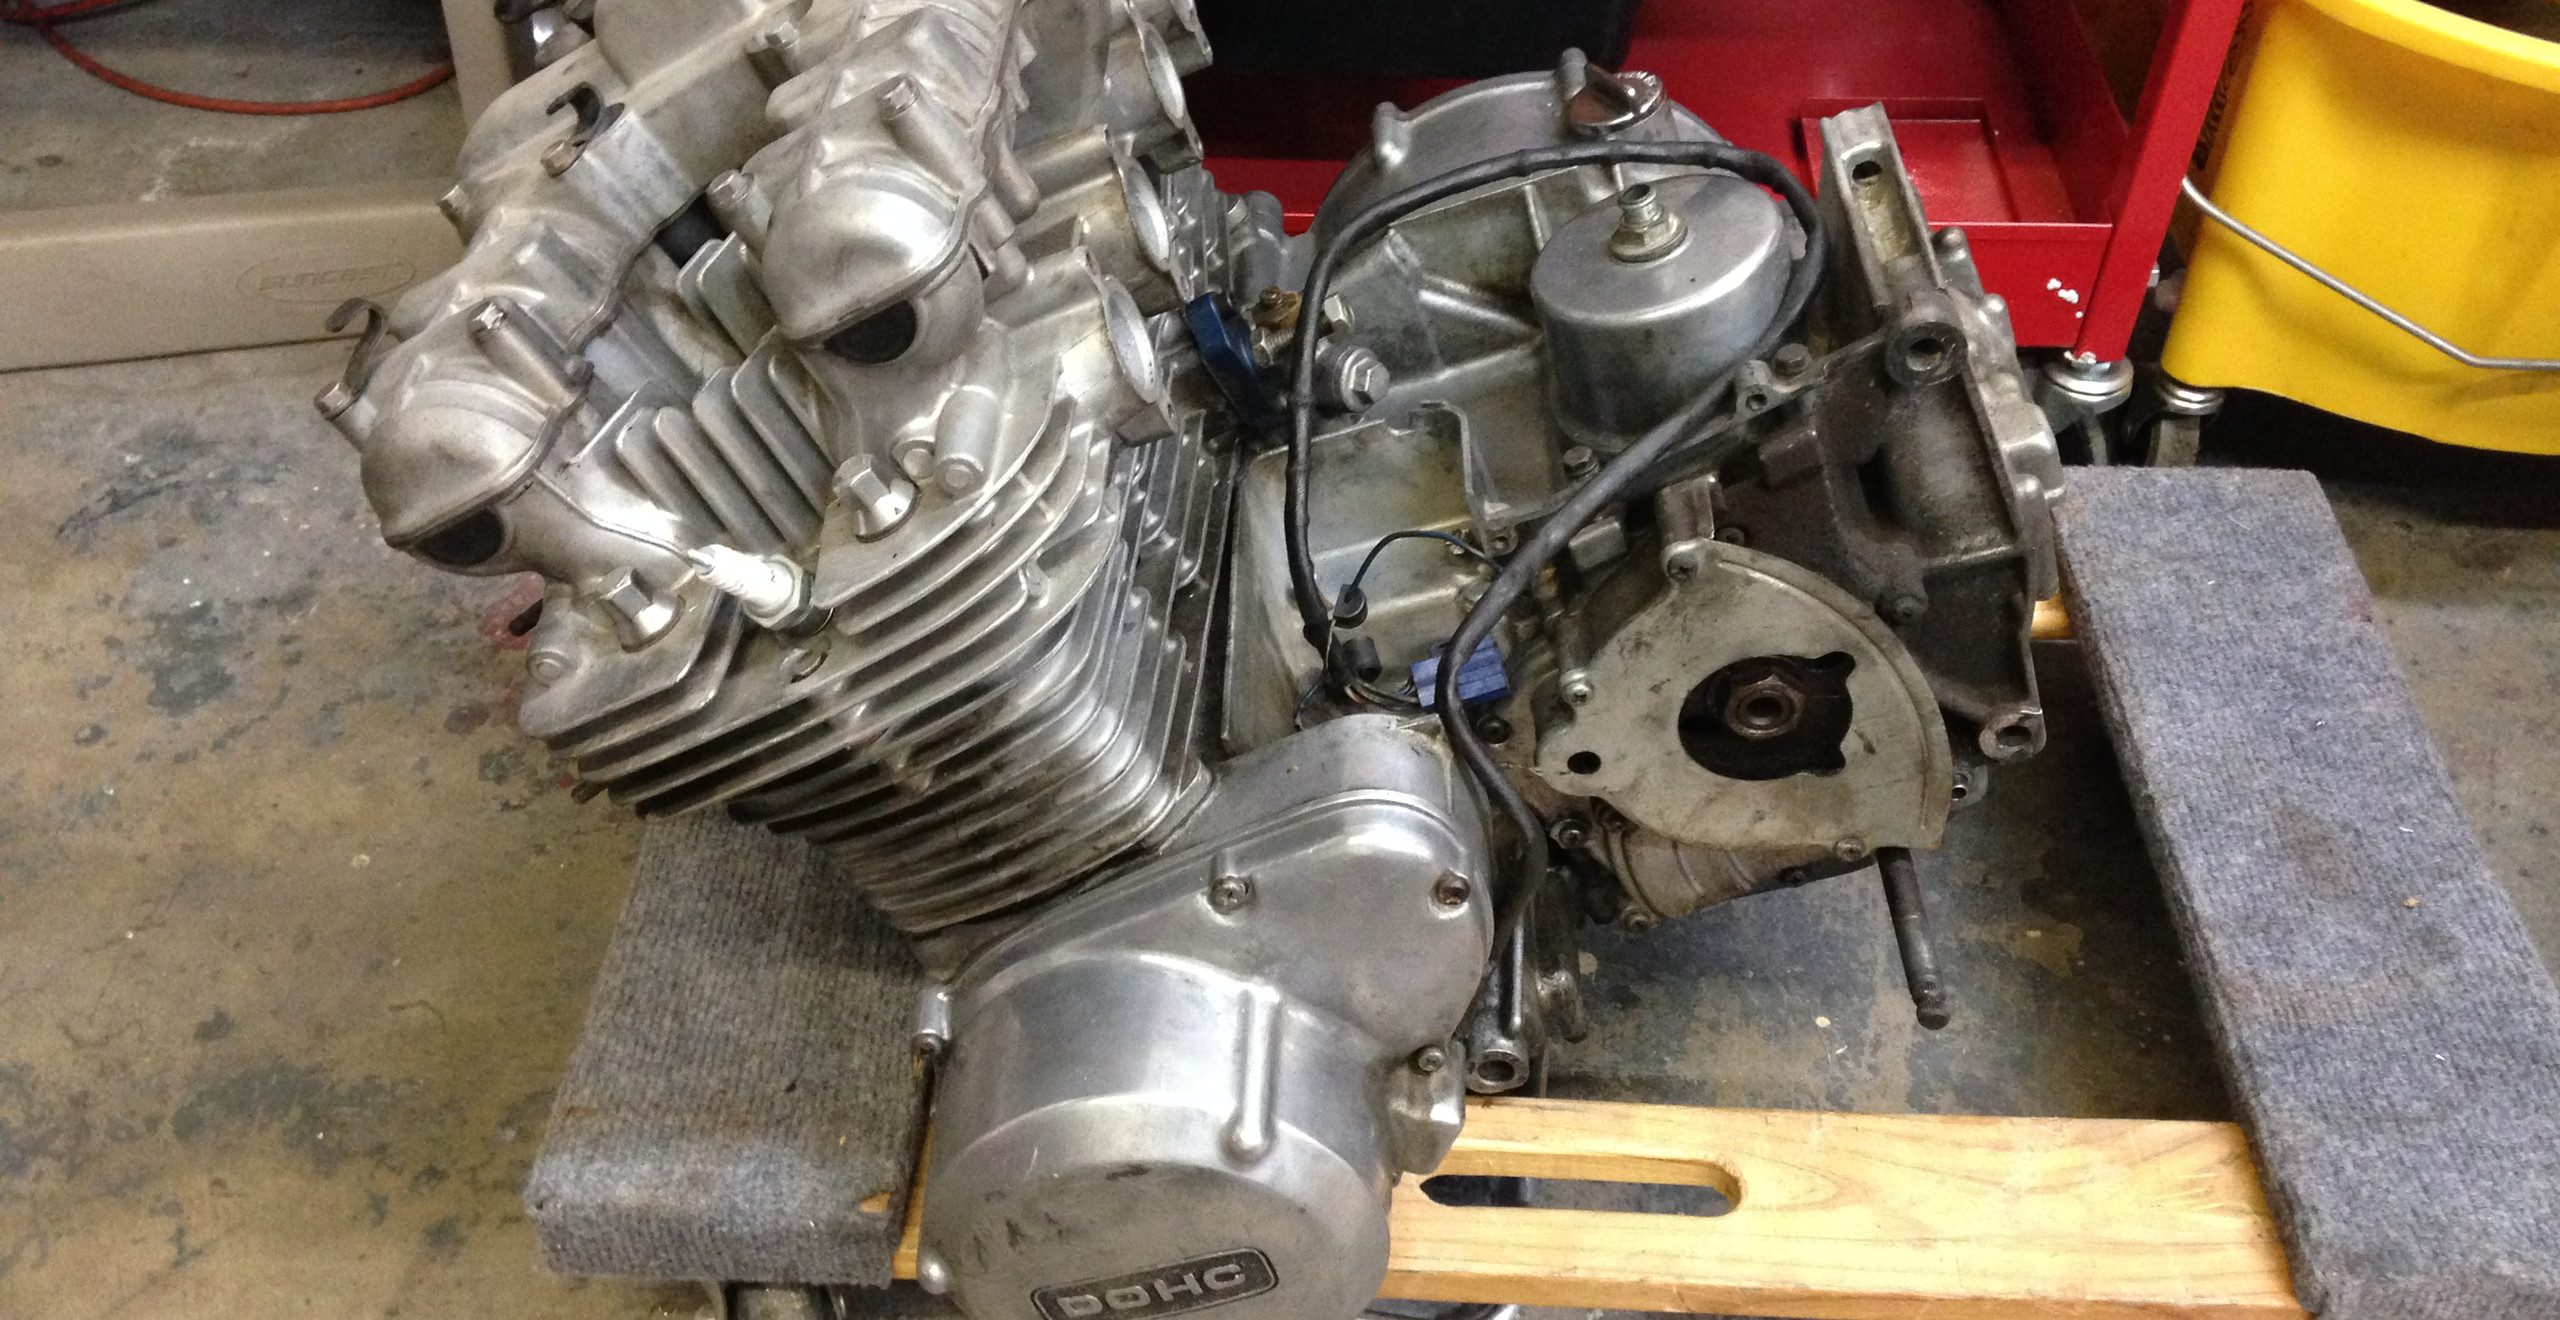 Kawasaki Z1 Restoration